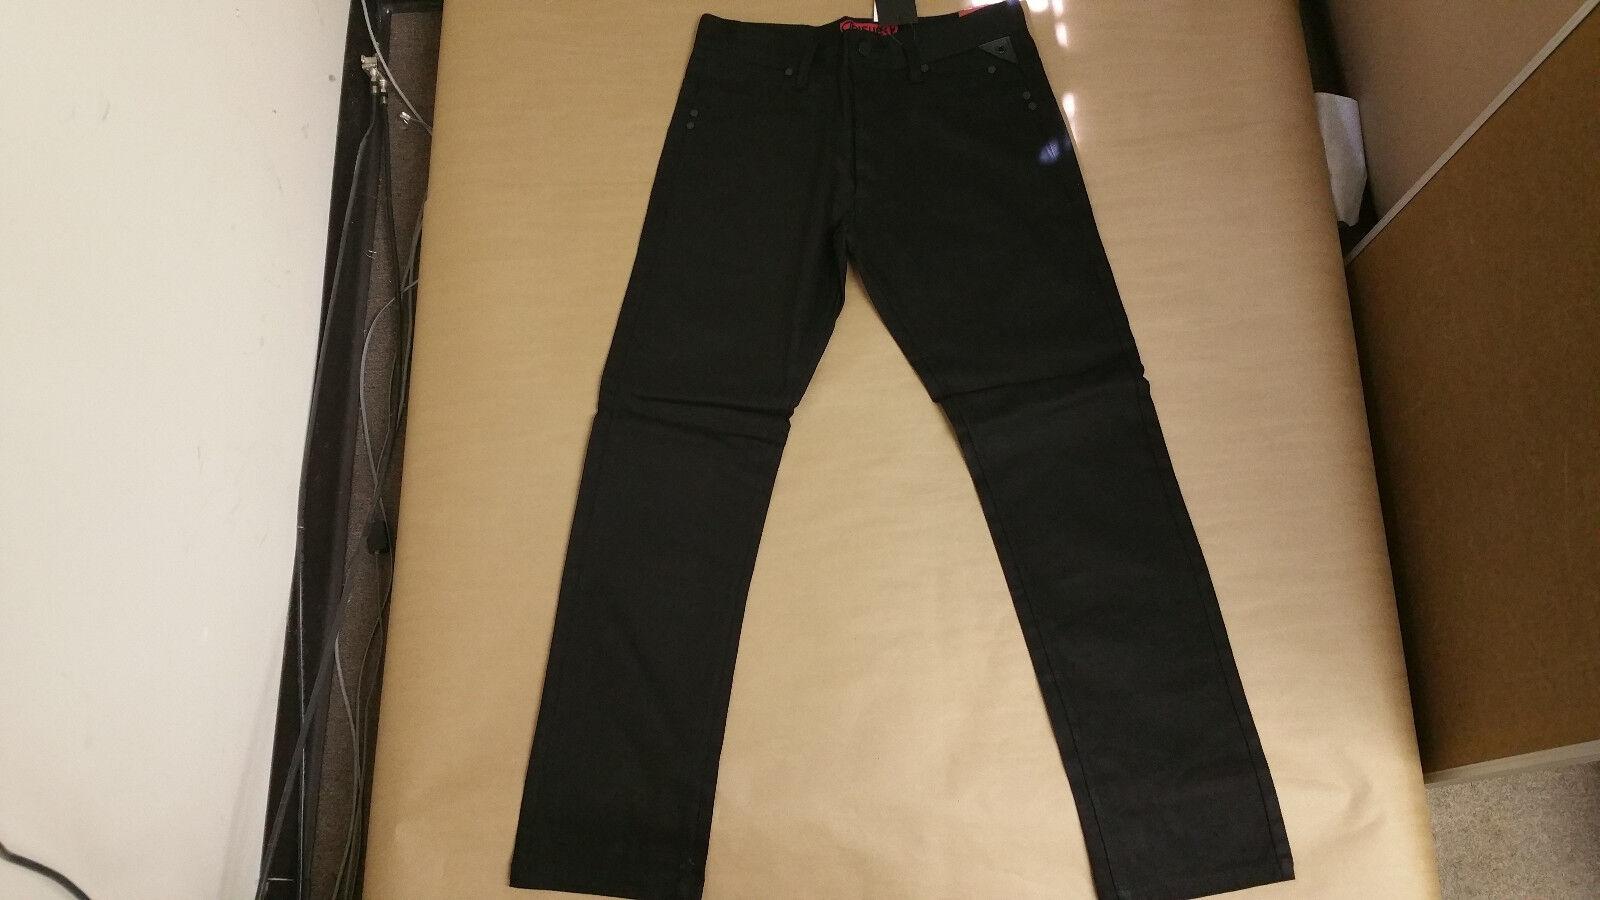 Orisue arquitecto H Hombres  Jeans Classic Fit Negro Talla 32-34  servicio considerado